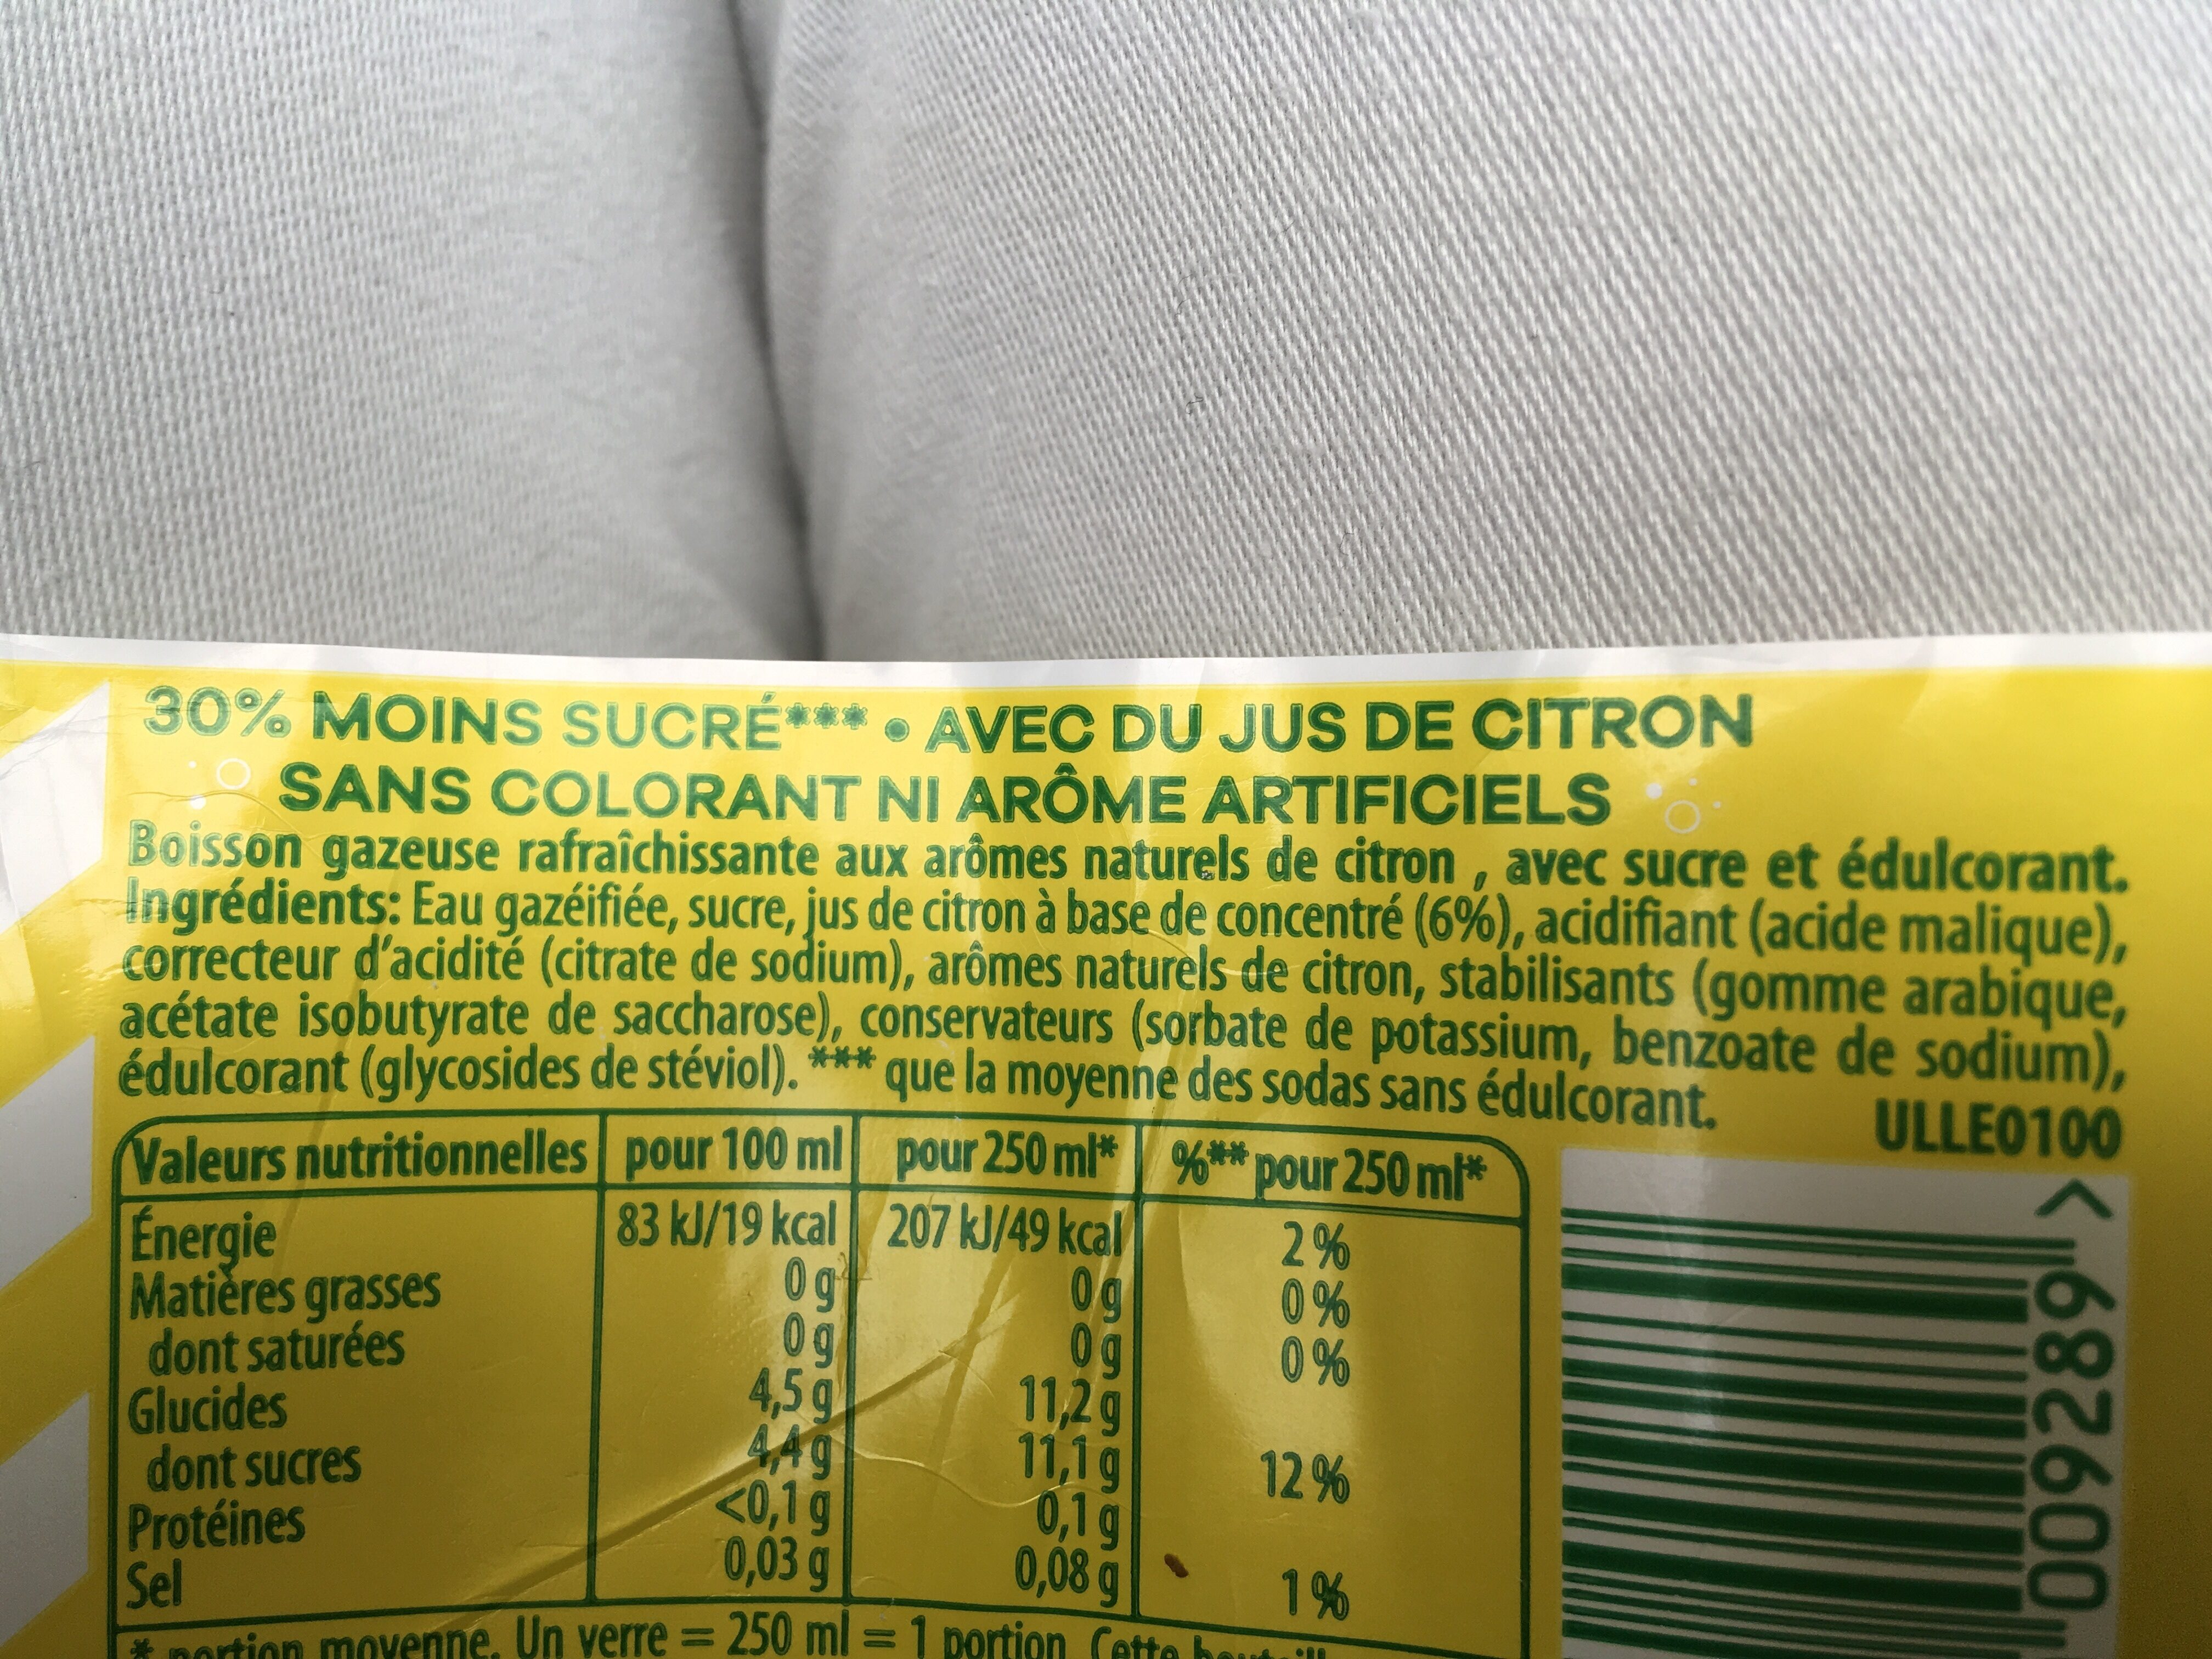 7UP Lemon Lemon Citronnade gazeuse citron - Ingredienti - fr